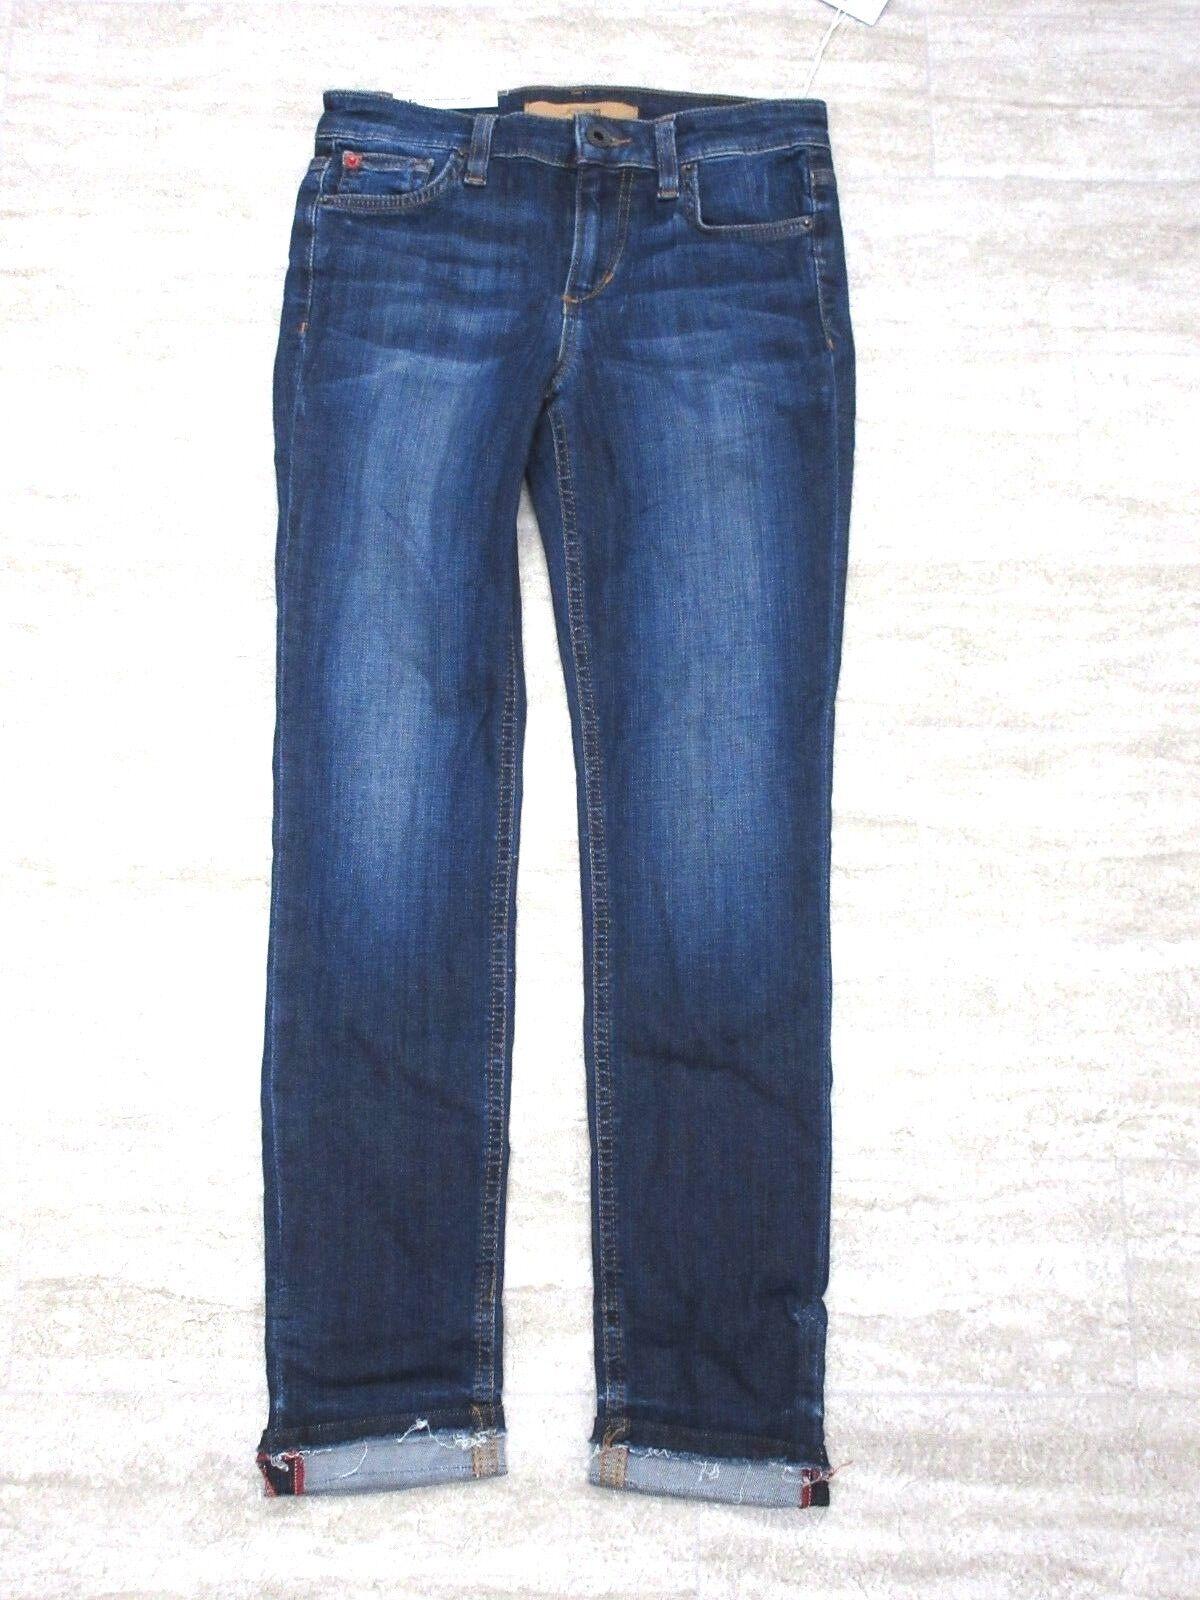 Nuova da Donna Joe's Jeans The Markie Corto Sophia Medio Medio Medio Alta Blu K6SSOA5331 25 18e8ba